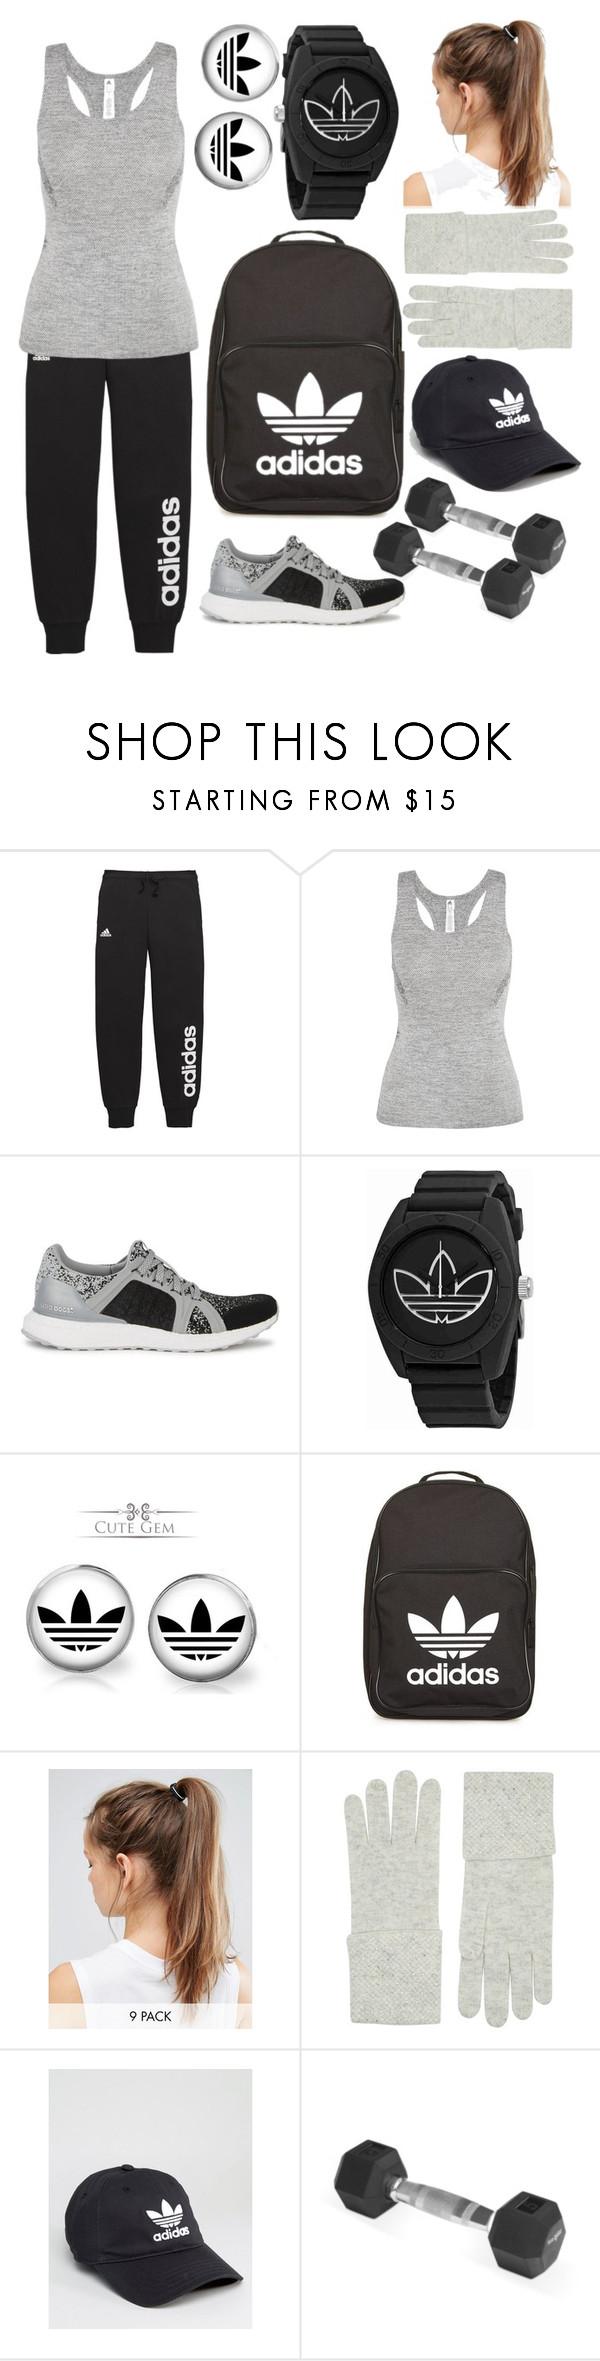 """adidas"" by jasmine-hapsari ❤ liked on Polyvore featuring adidas, NIKE, William Sharp and Handle"